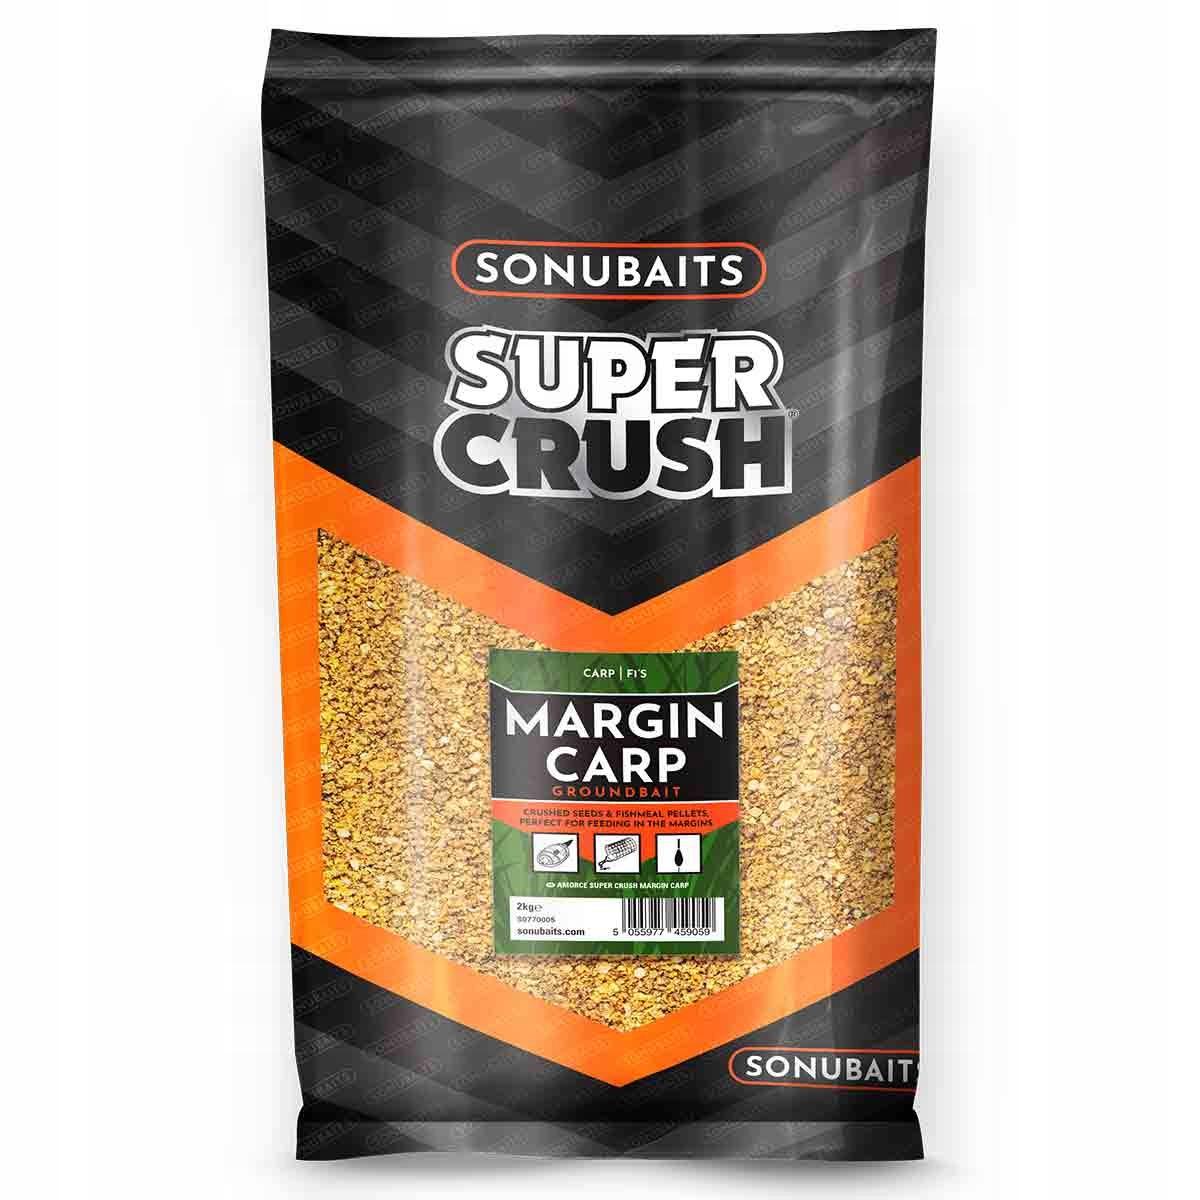 Sonubaits zanęta SuperCrush Margin Carp